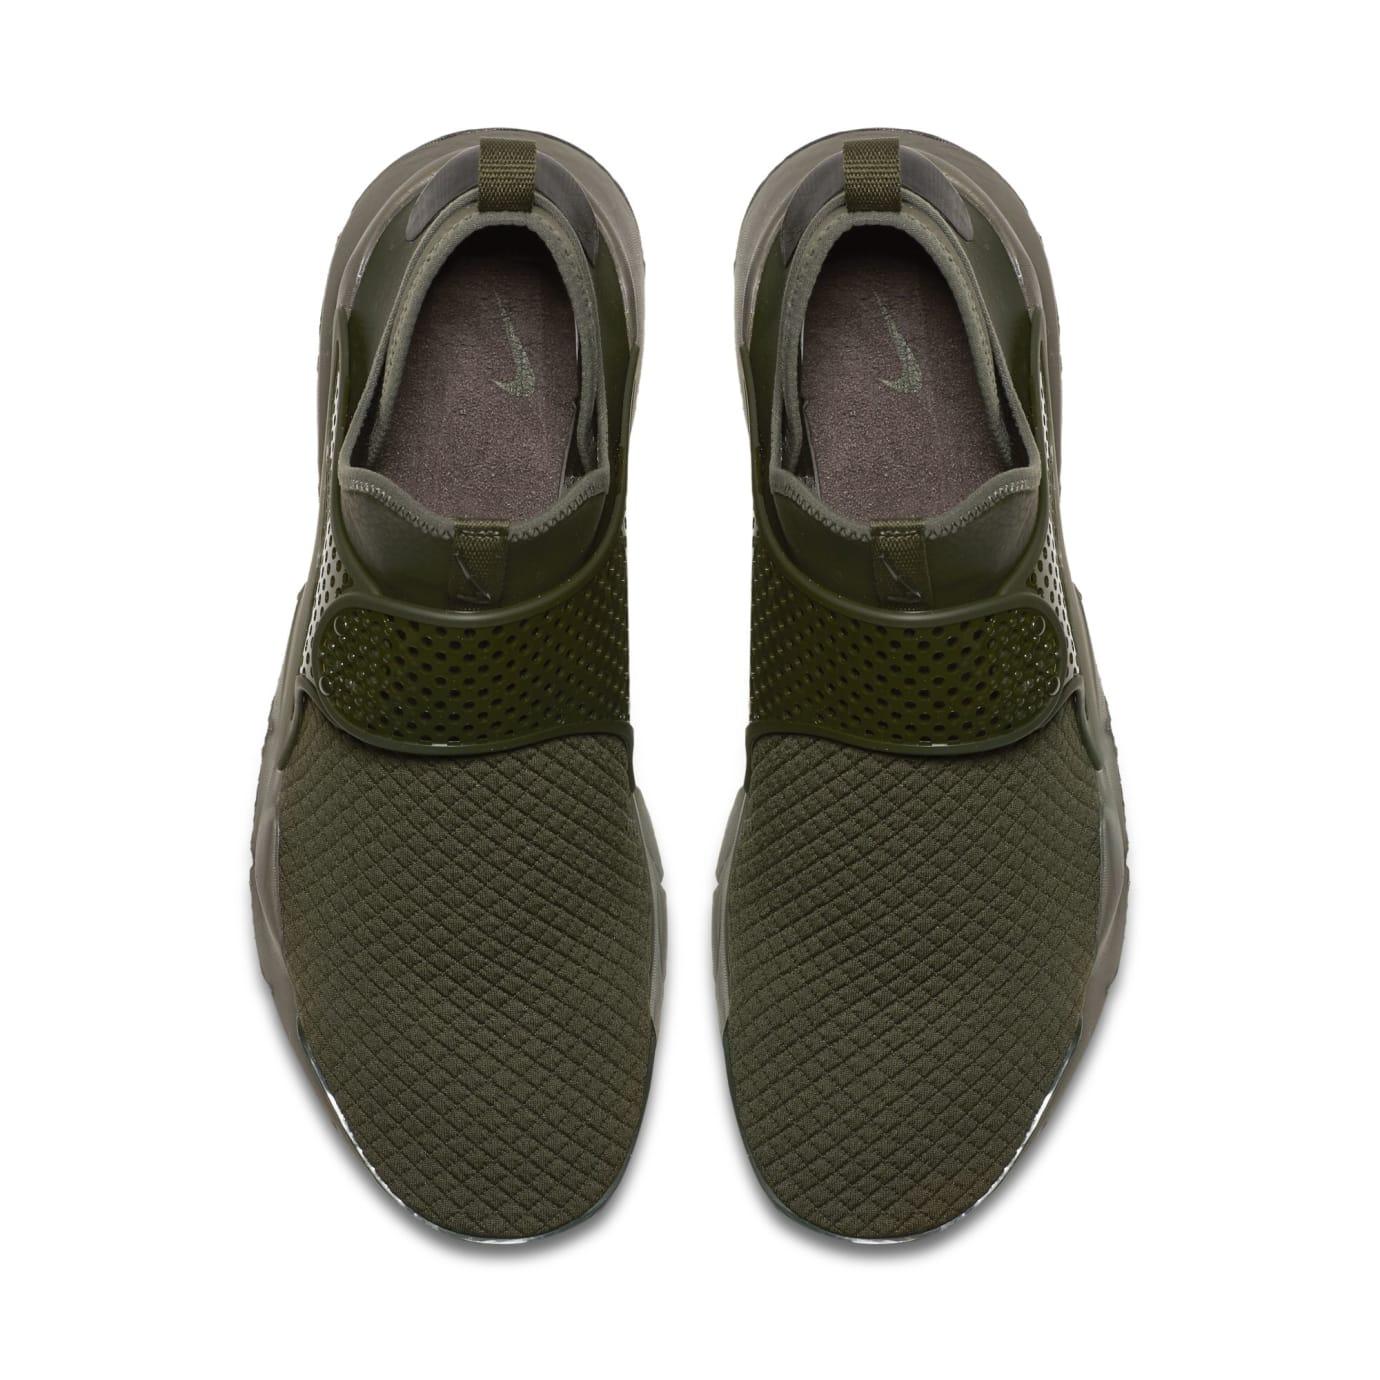 Nike Sock Dart Mid Olive (Top)